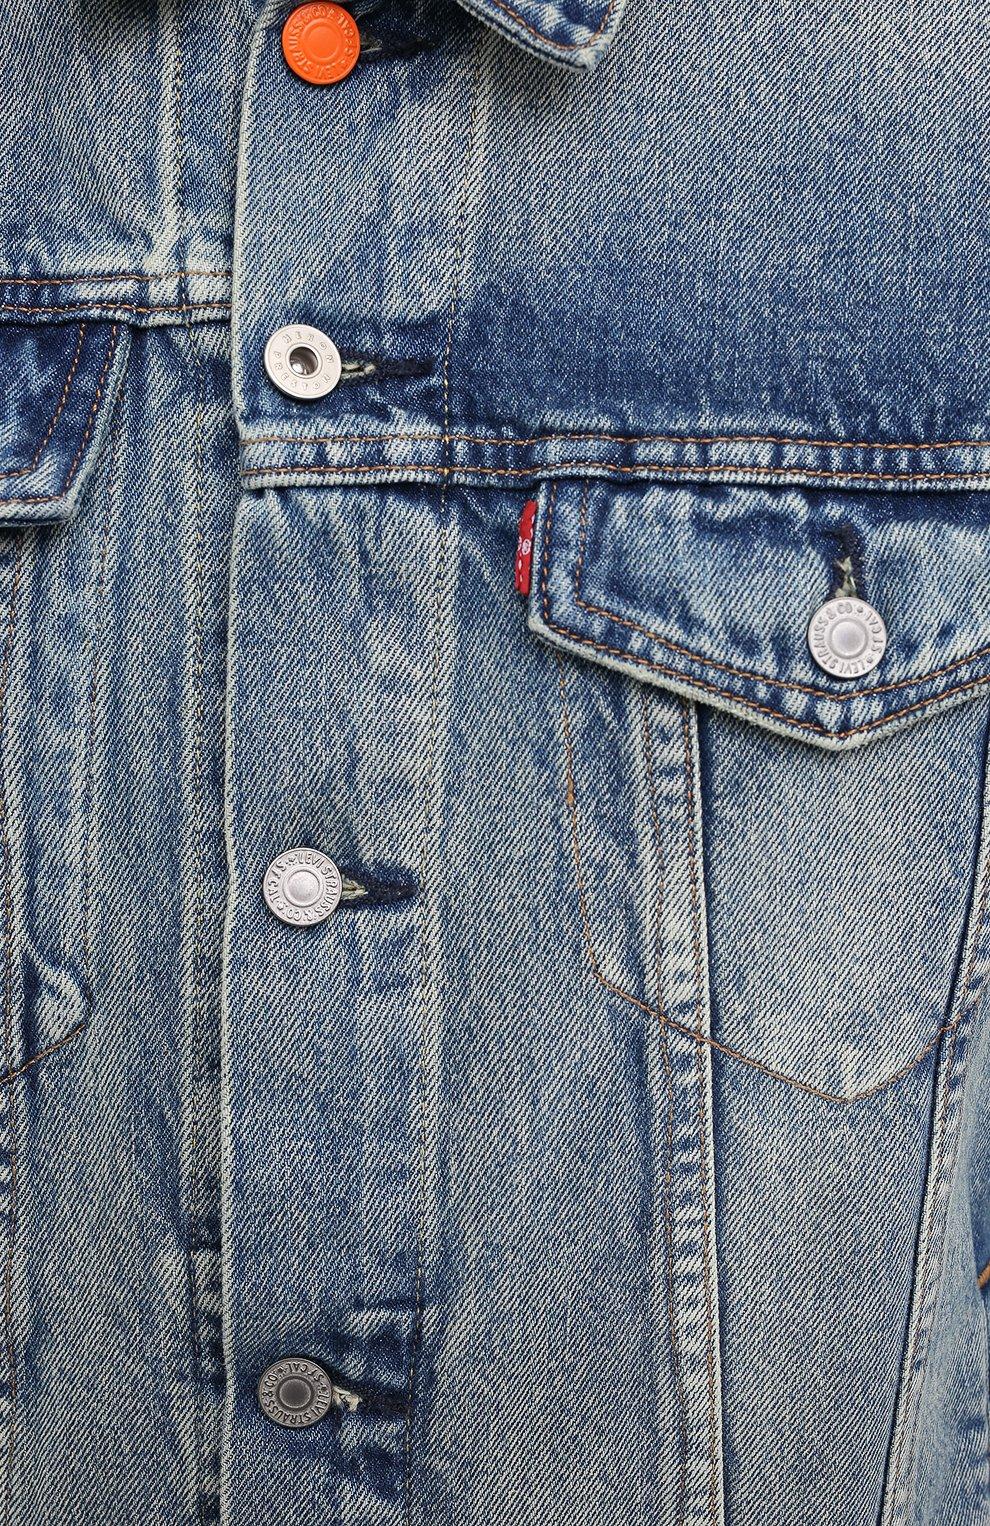 Мужская джинсовая куртка heron preston x levi's HERON PRESTON синего цвета, арт. HMYE006S209250237388 | Фото 5